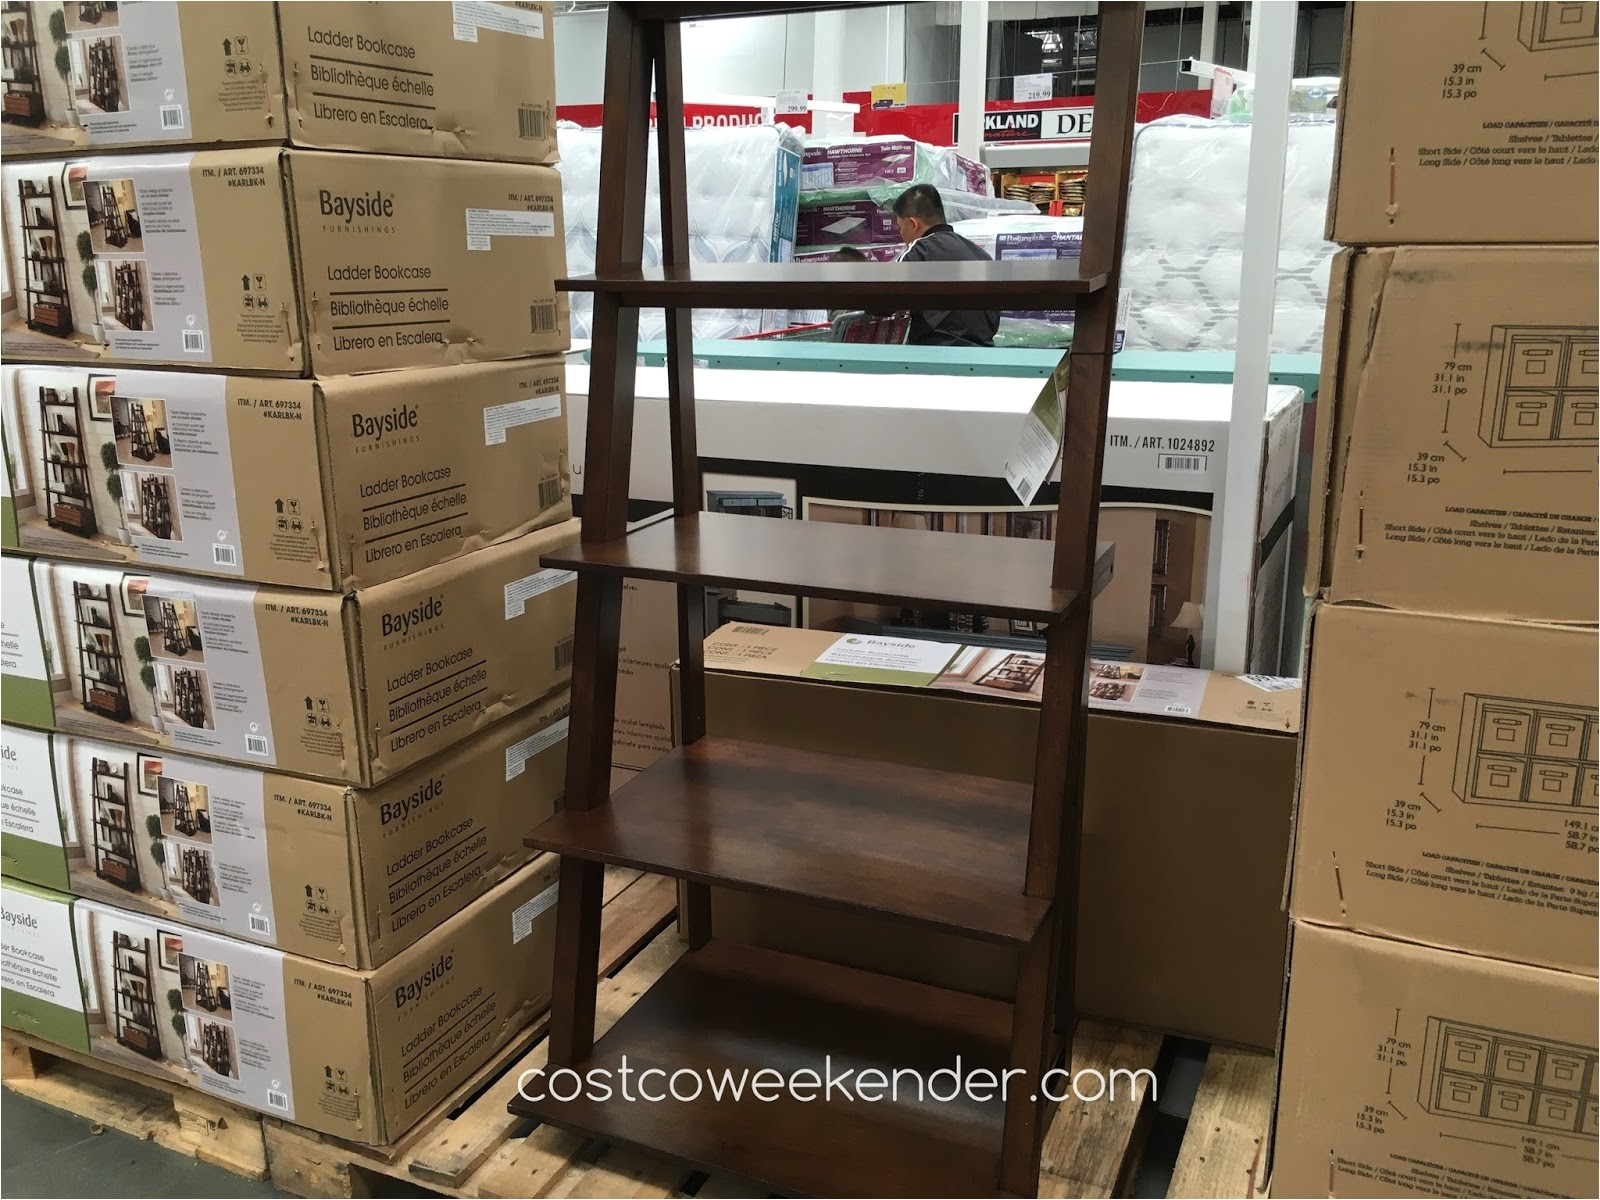 Bayside Furnishings Ladder Bookcase Bayside Furnishings Ladder Bookcase Costco Weekender